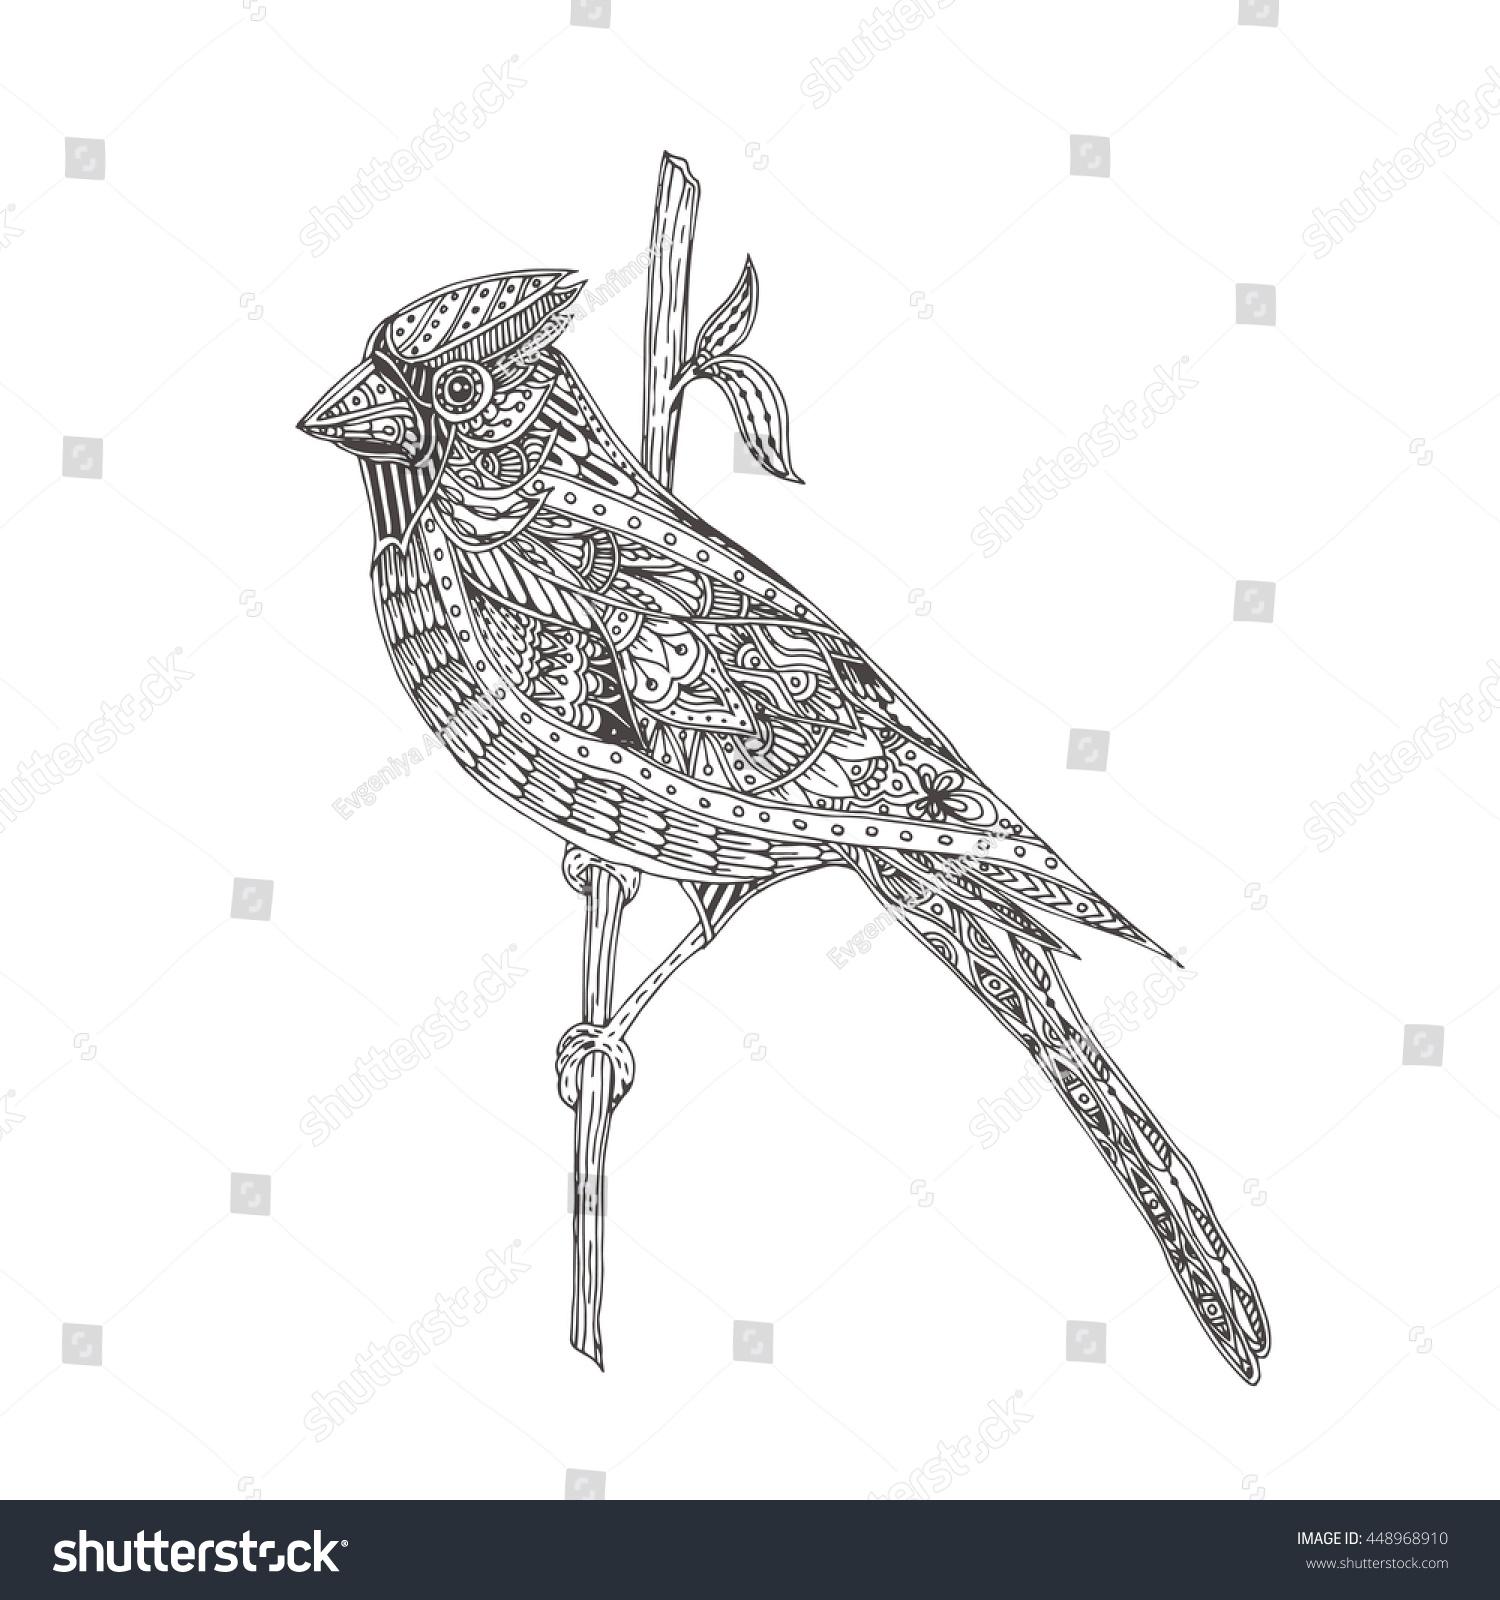 Bird Handdrawn Bird Cardinal Ethnic Doodle Stock Vector 448968910